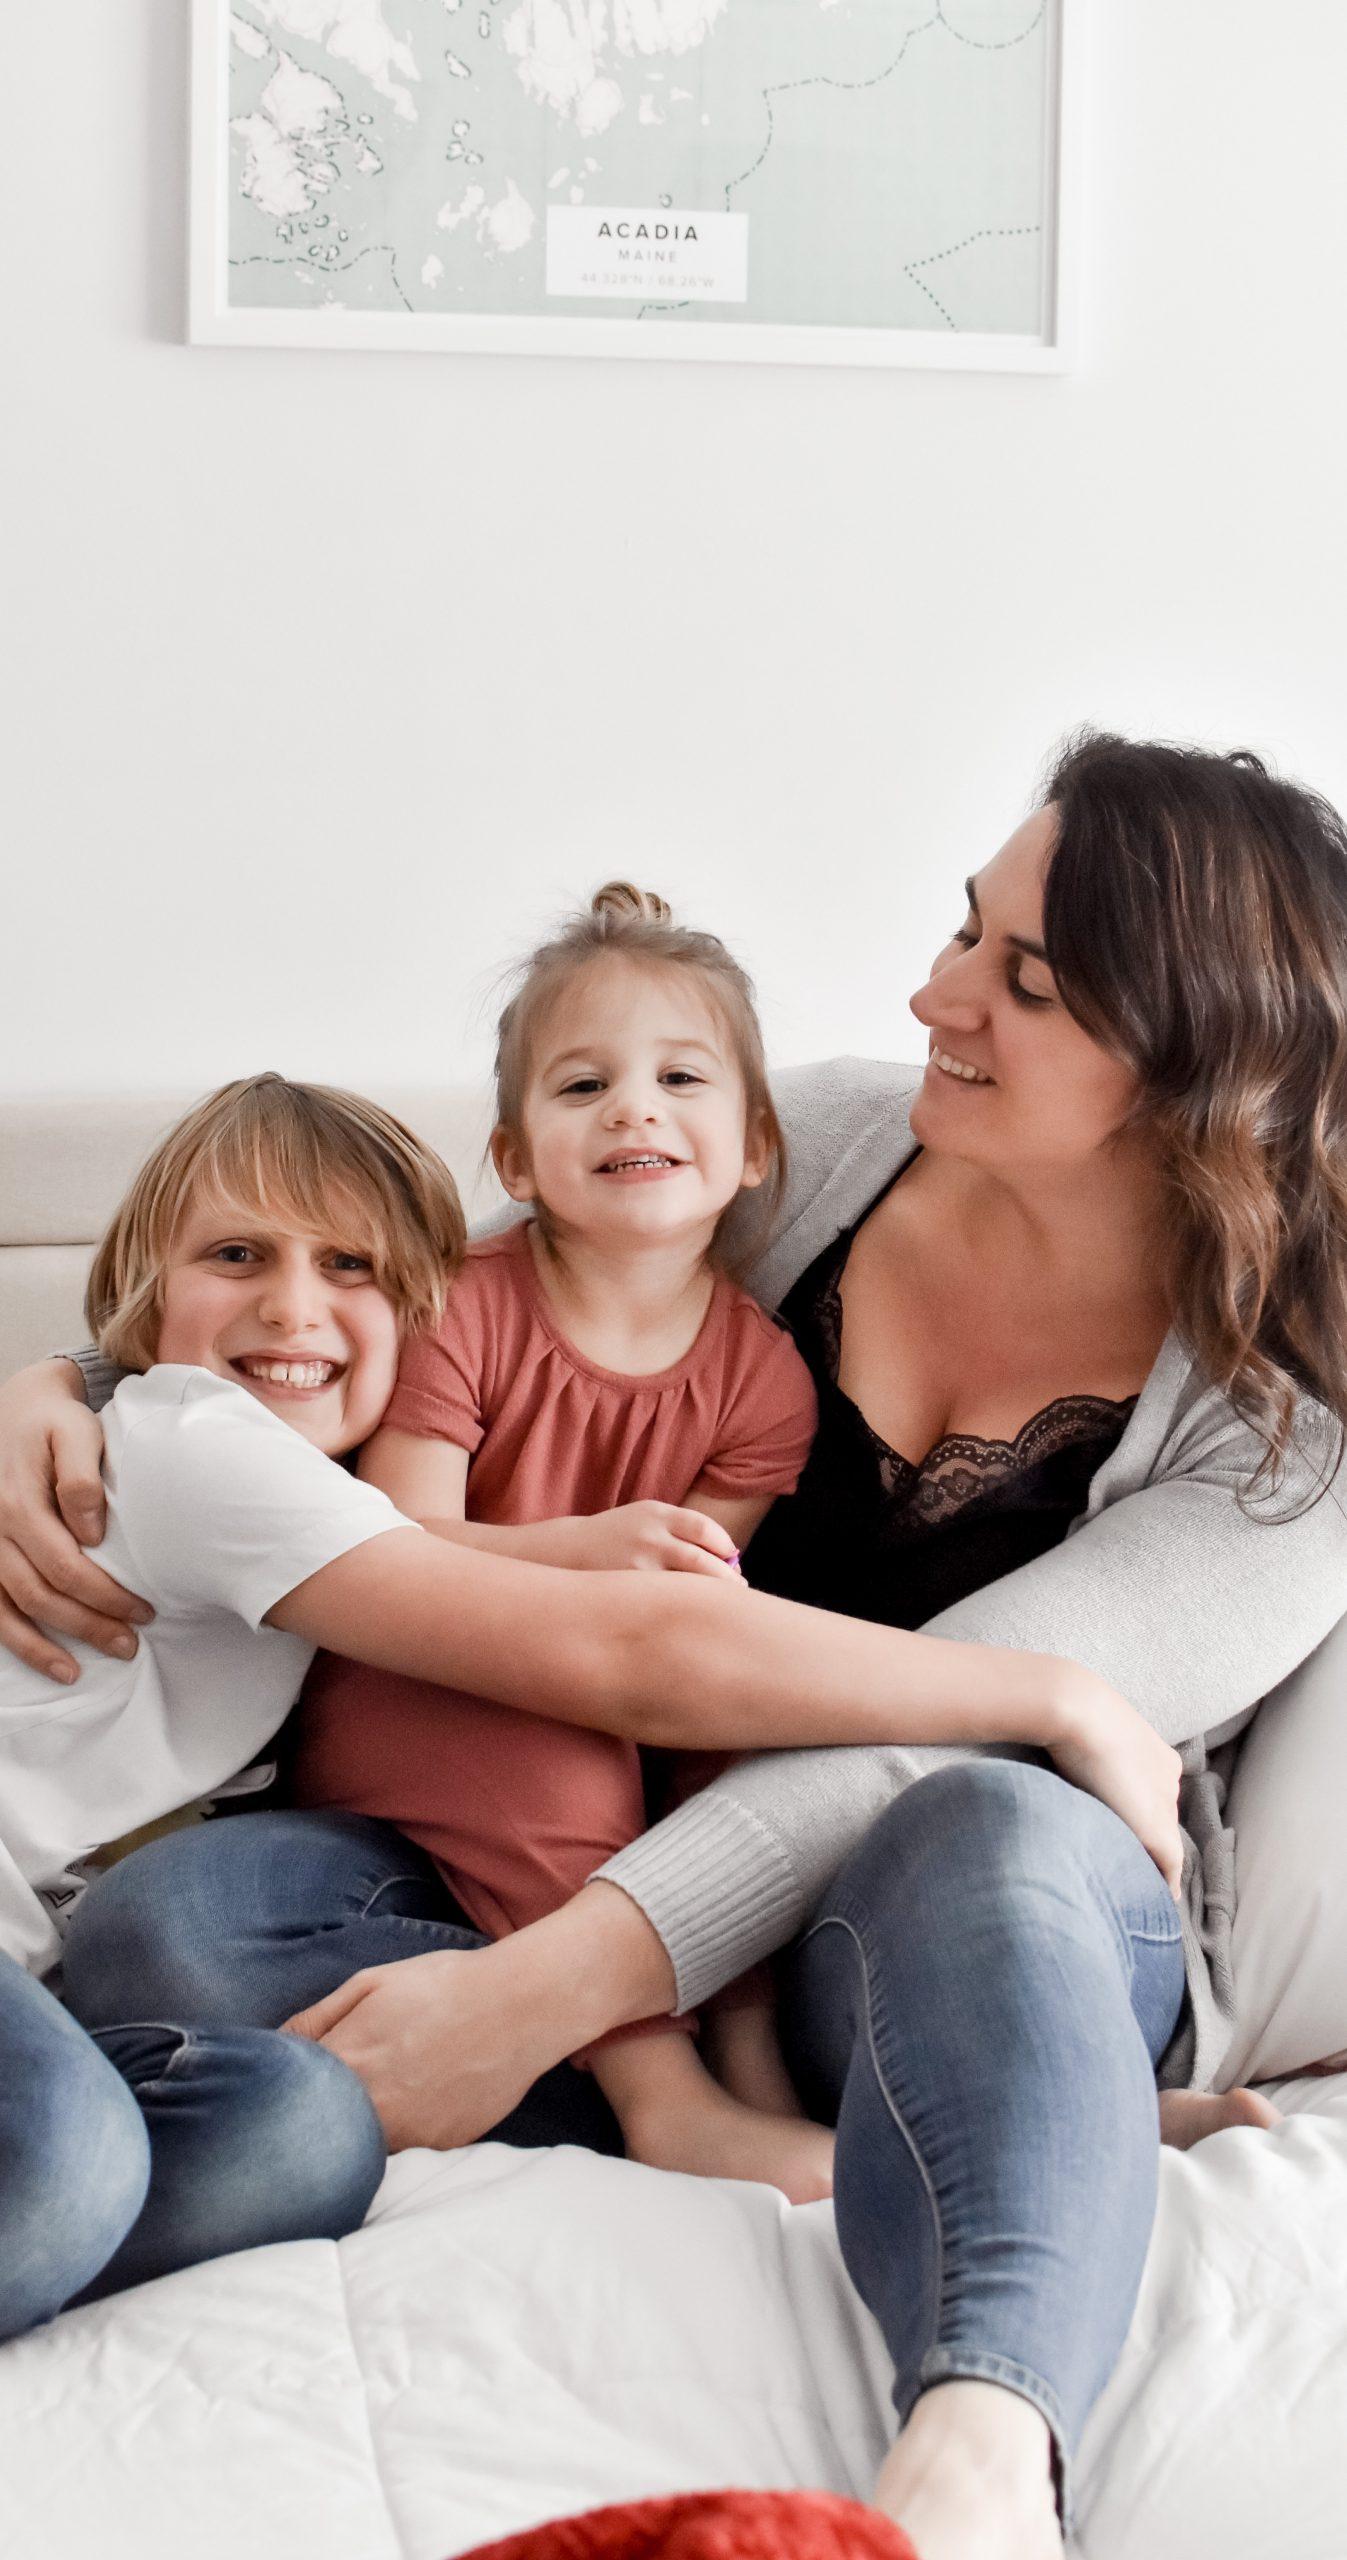 Positive affirmations for moms